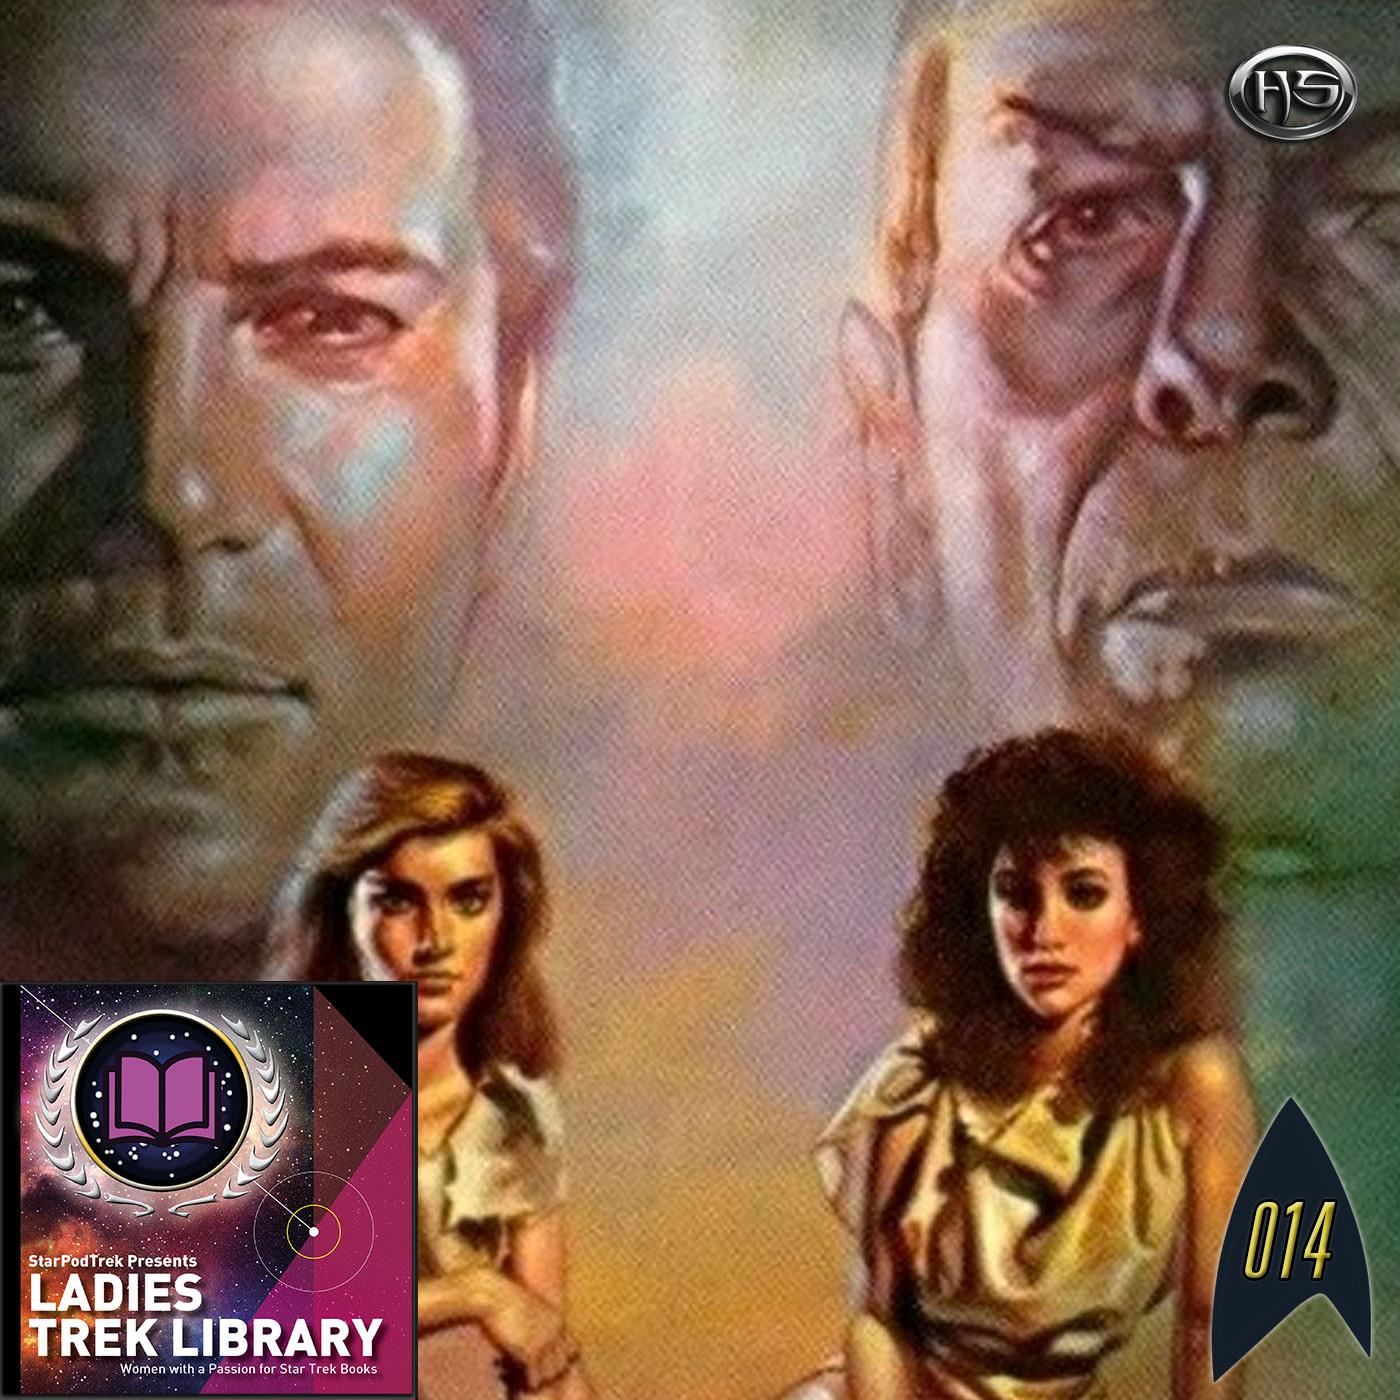 Ladies Trek Library Episode 14